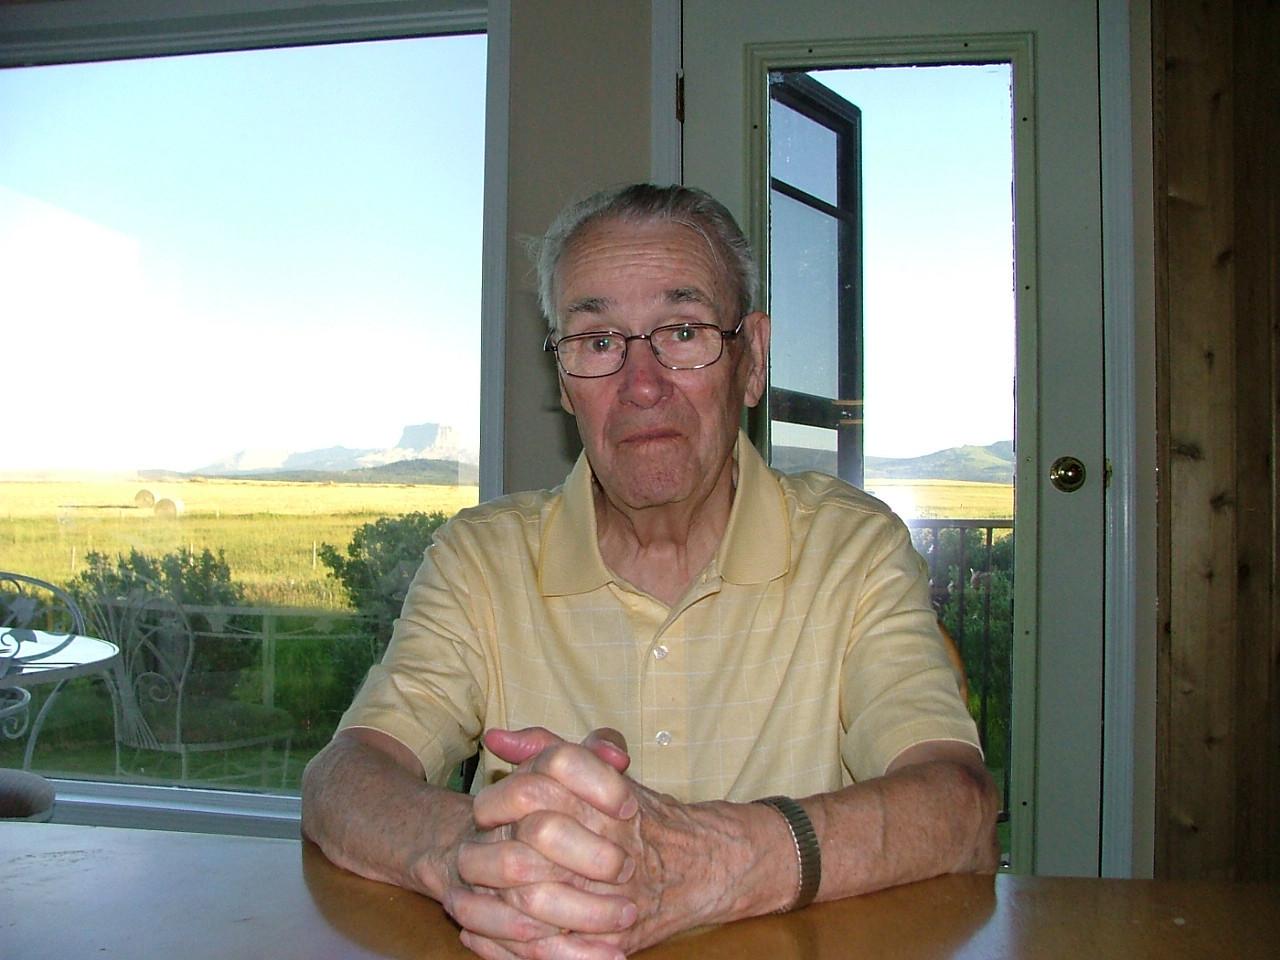 Grandpa Spackman